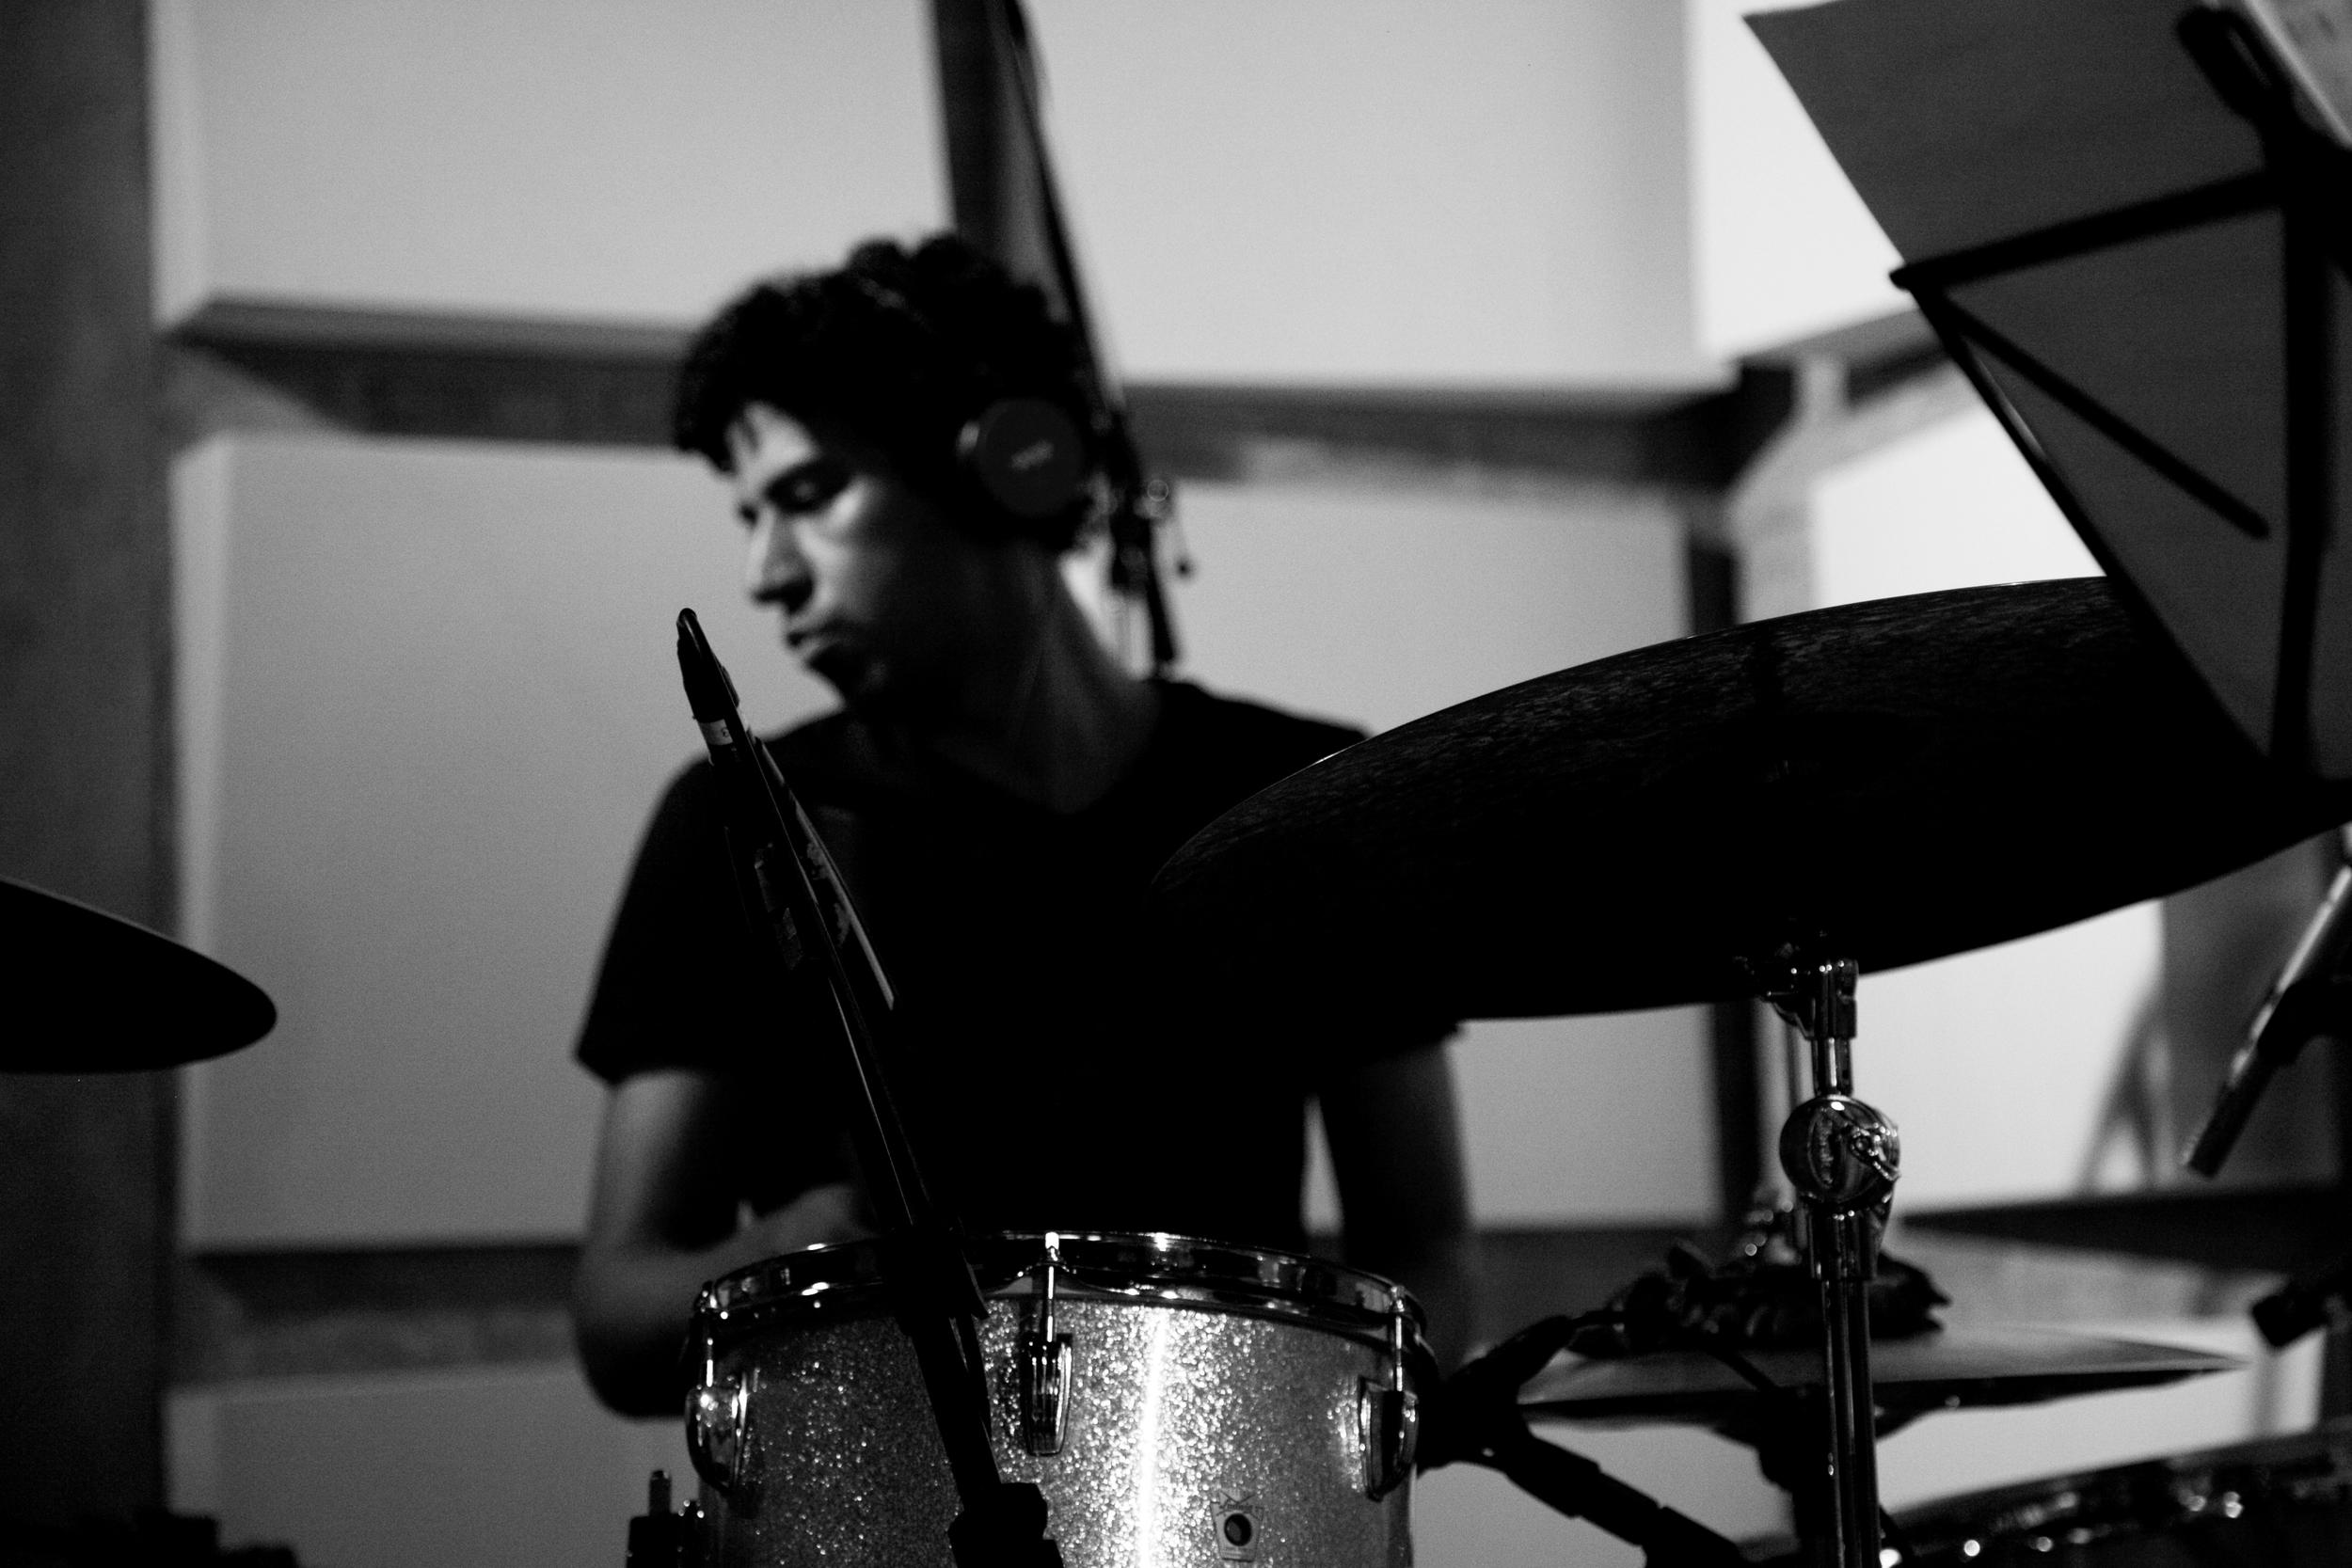 Drums_1_BW_03.jpg